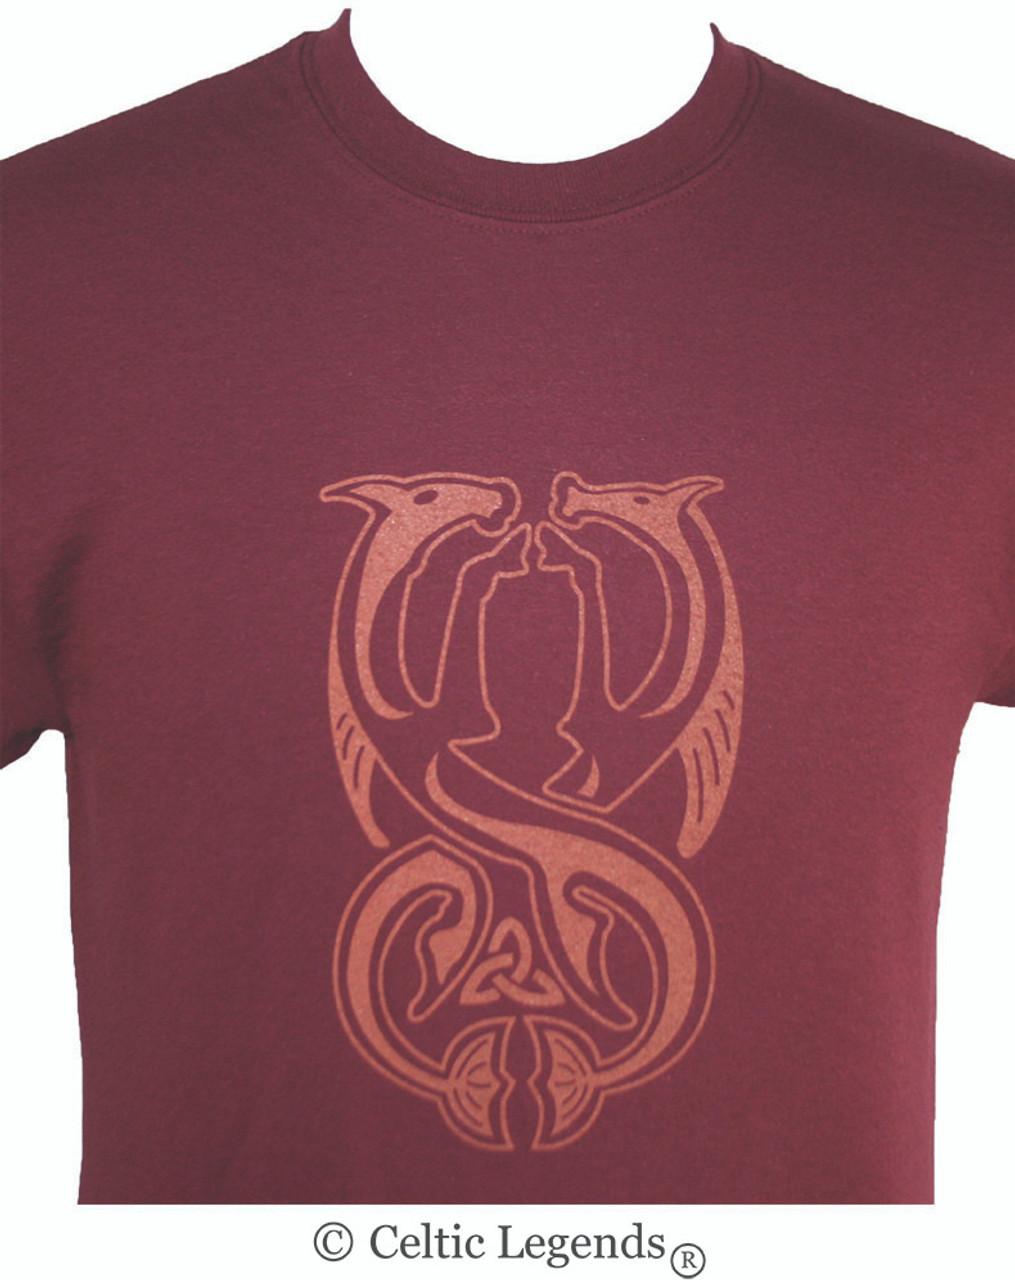 Alberlemno T-Shirt